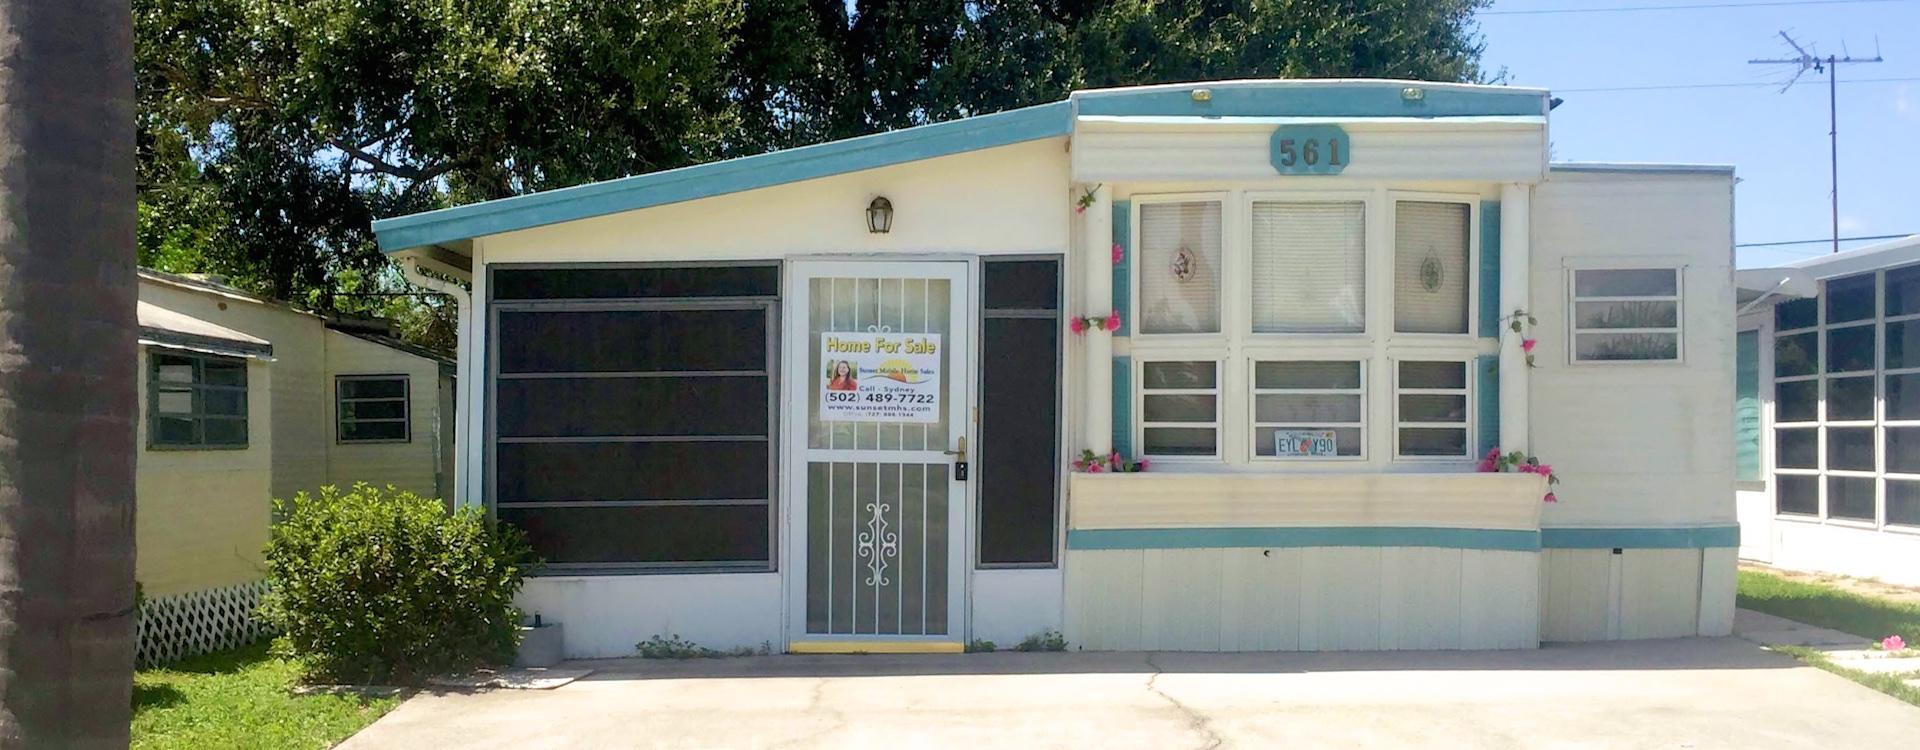 Family Mobile Home Parks Sarasota